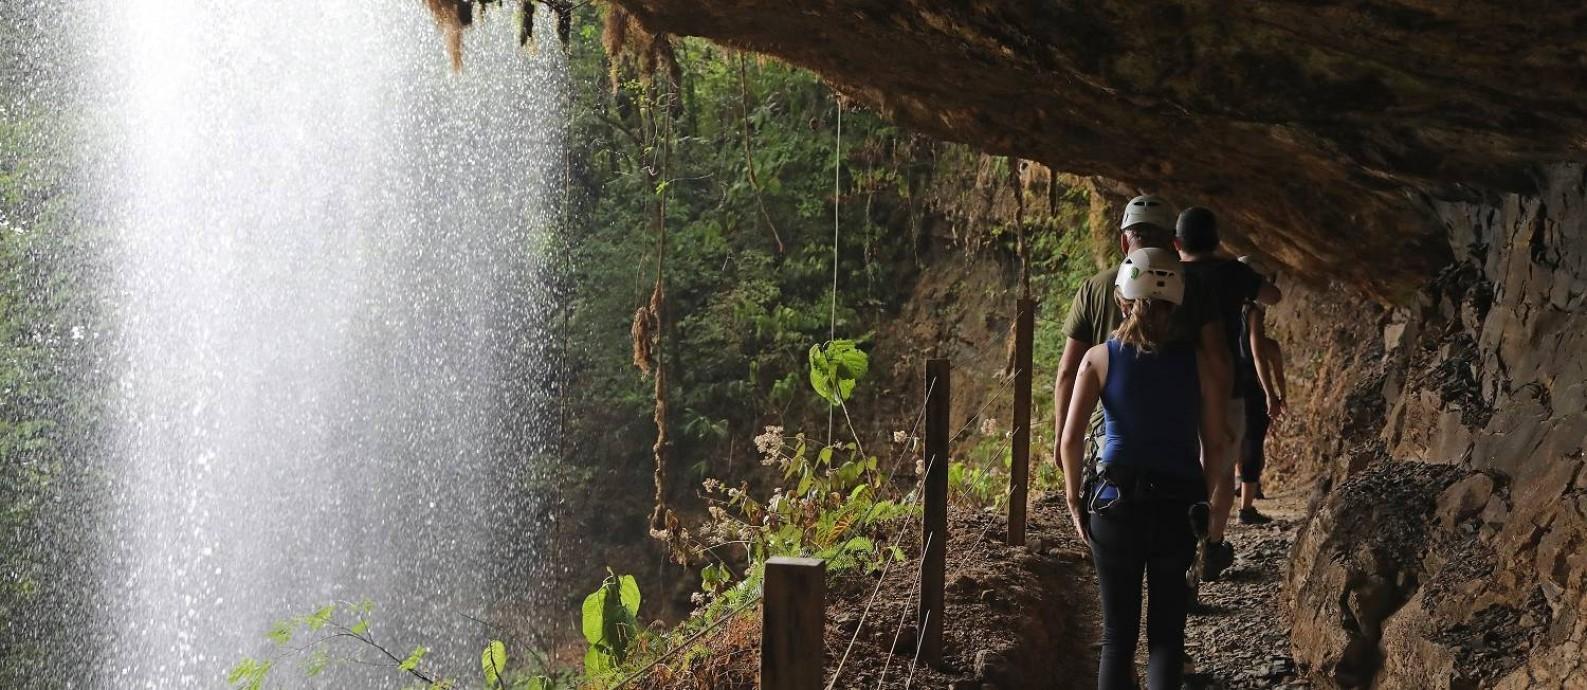 Turismo na Costa Rica cresce acima da média mundial Foto: Armando Del Vecchio / Agência O Globo